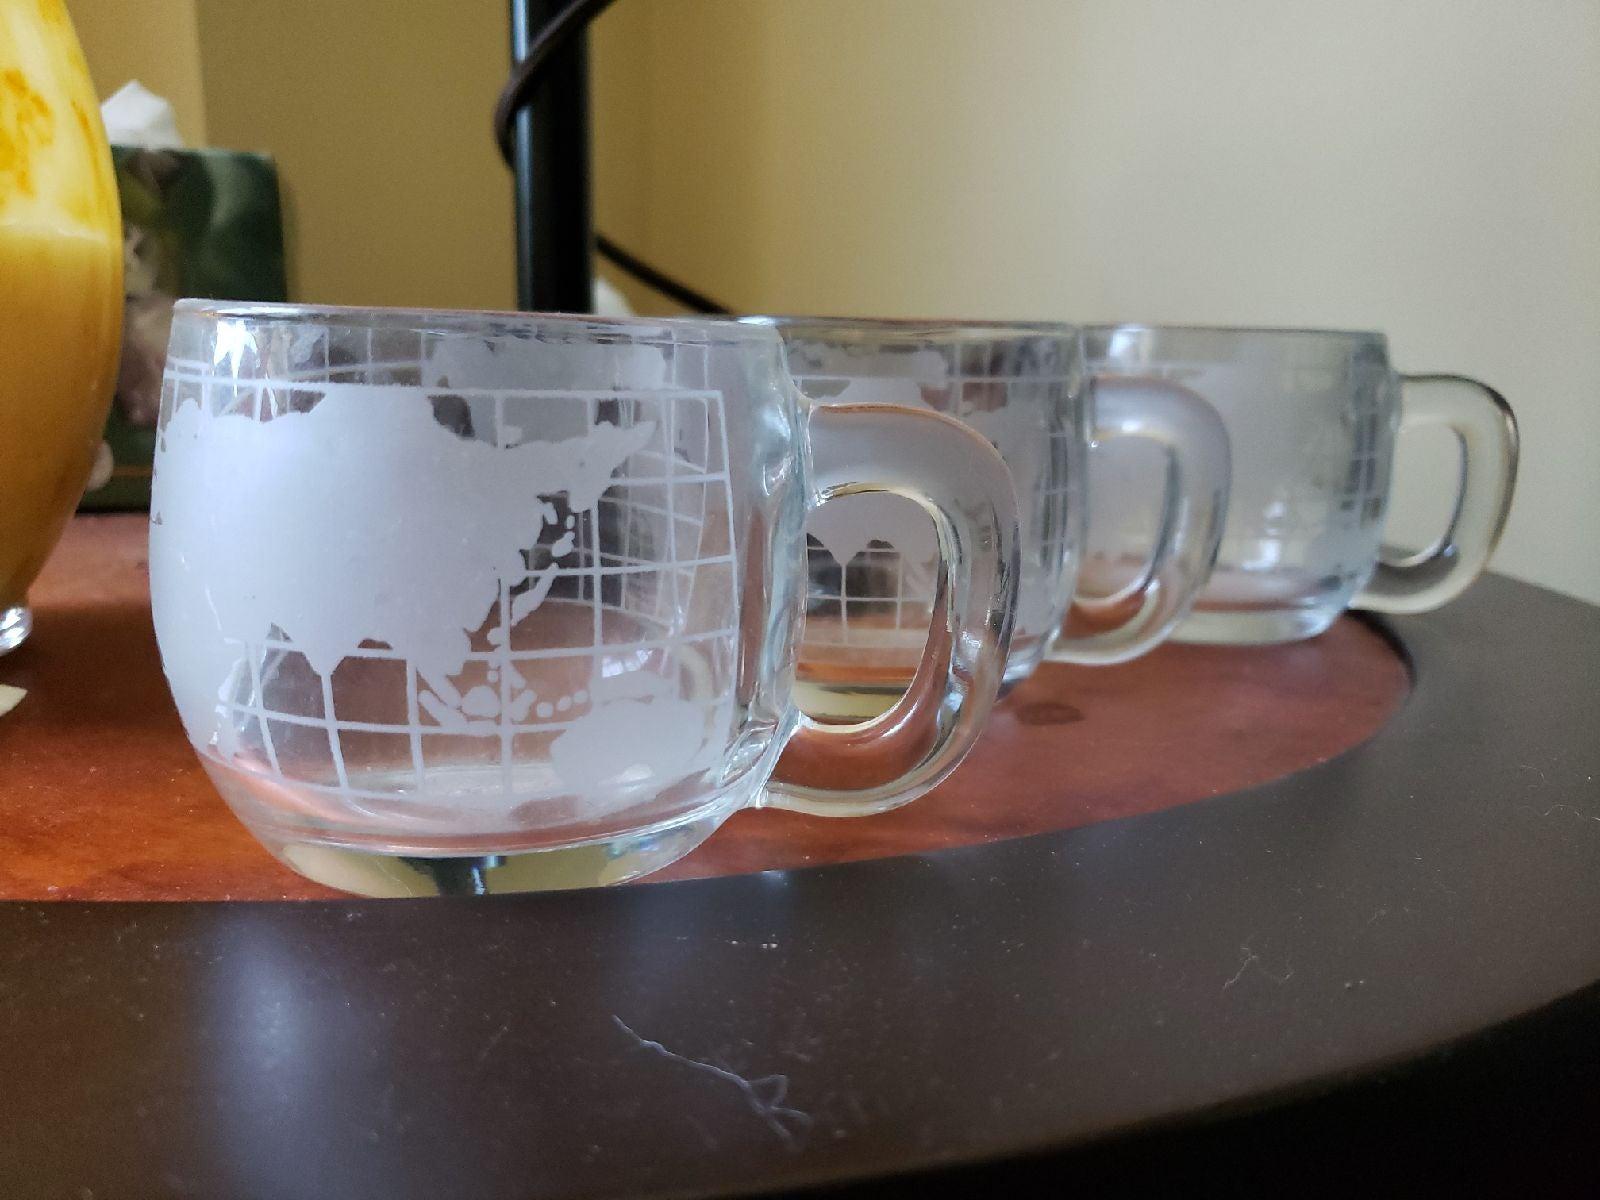 3 Nescafe world mug set